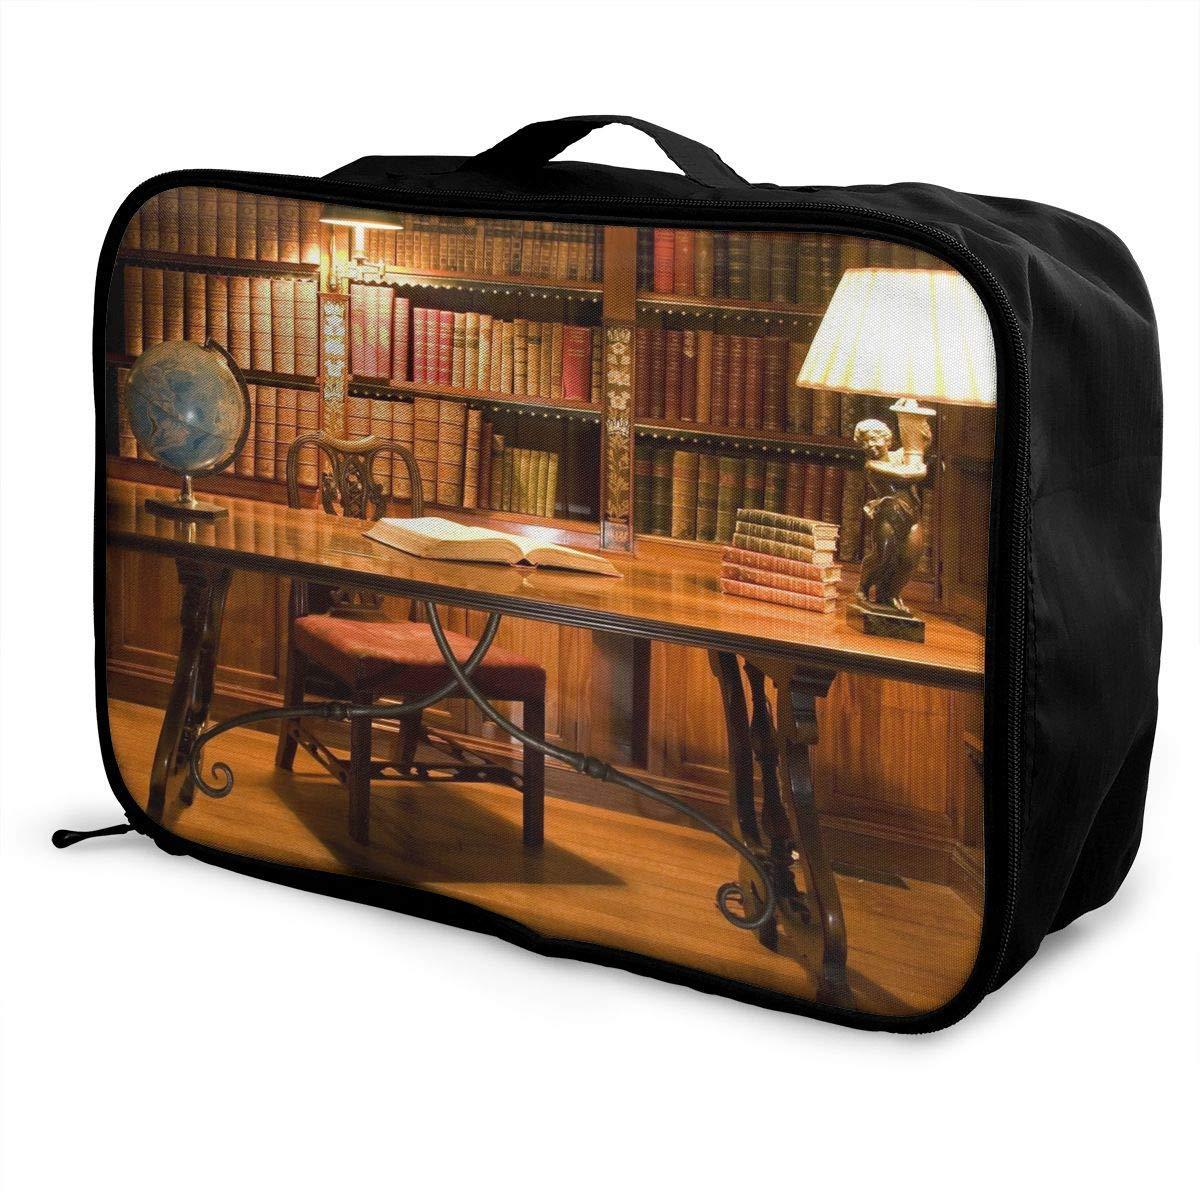 Lightweight Large Capacity Portable Duffel Bag for Men /& Women Sleeping Sea Lion Travel Duffel Bag Backpack JTRVW Luggage Bags for Travel